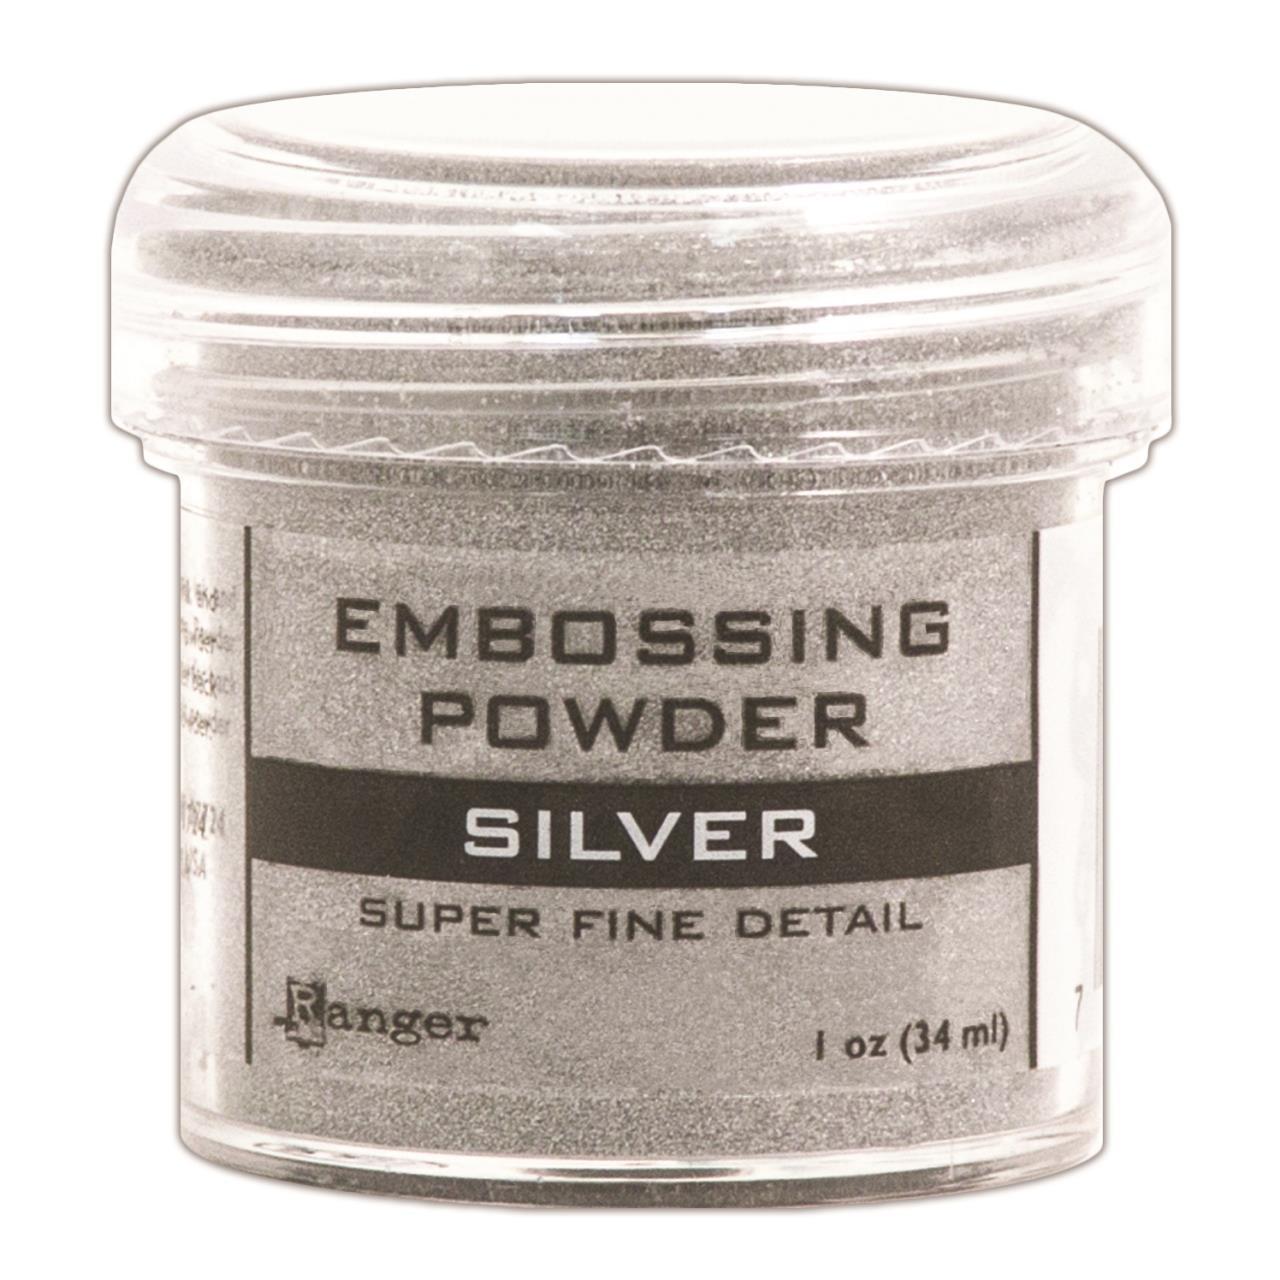 Ranger Super Fine Embossing Powder, Silver -